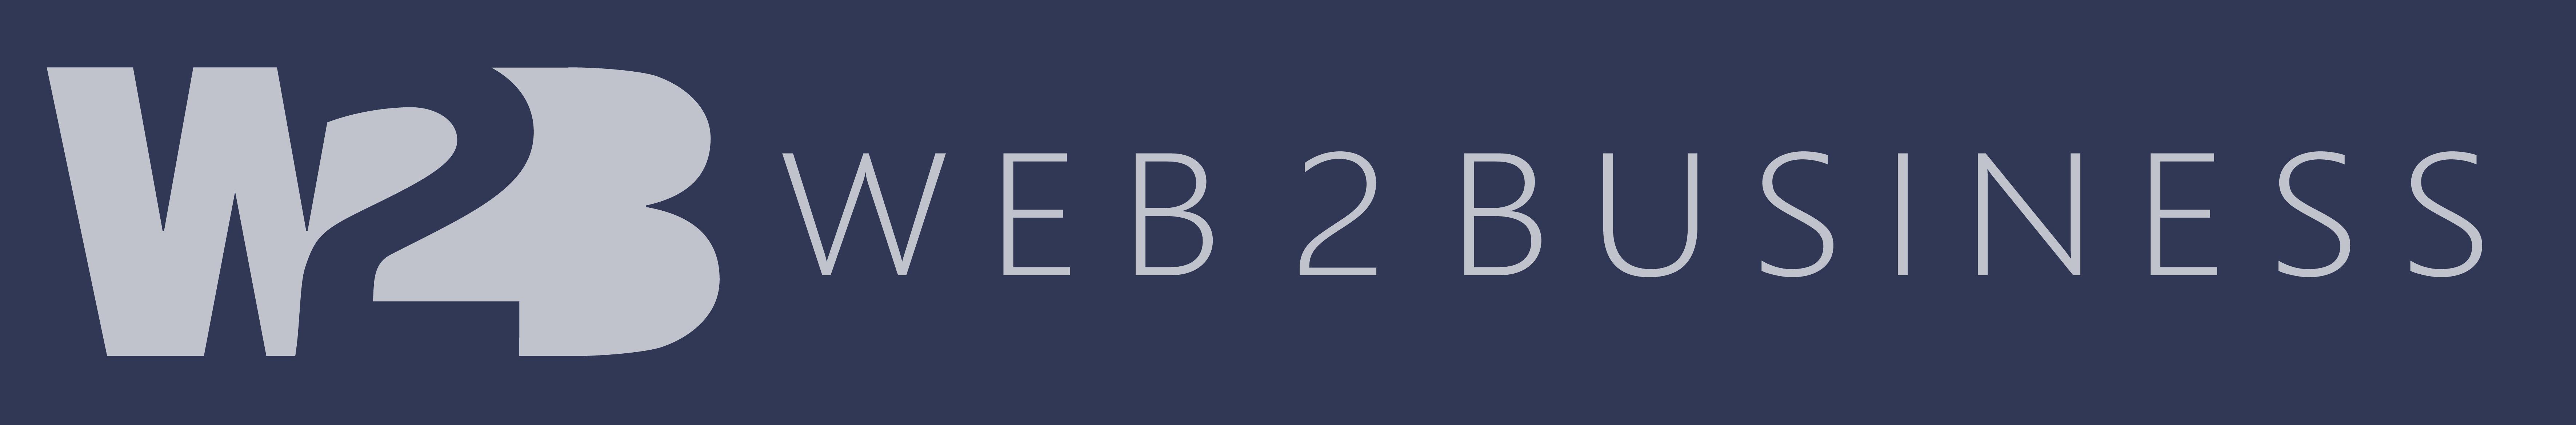 Web 2 Business logo header